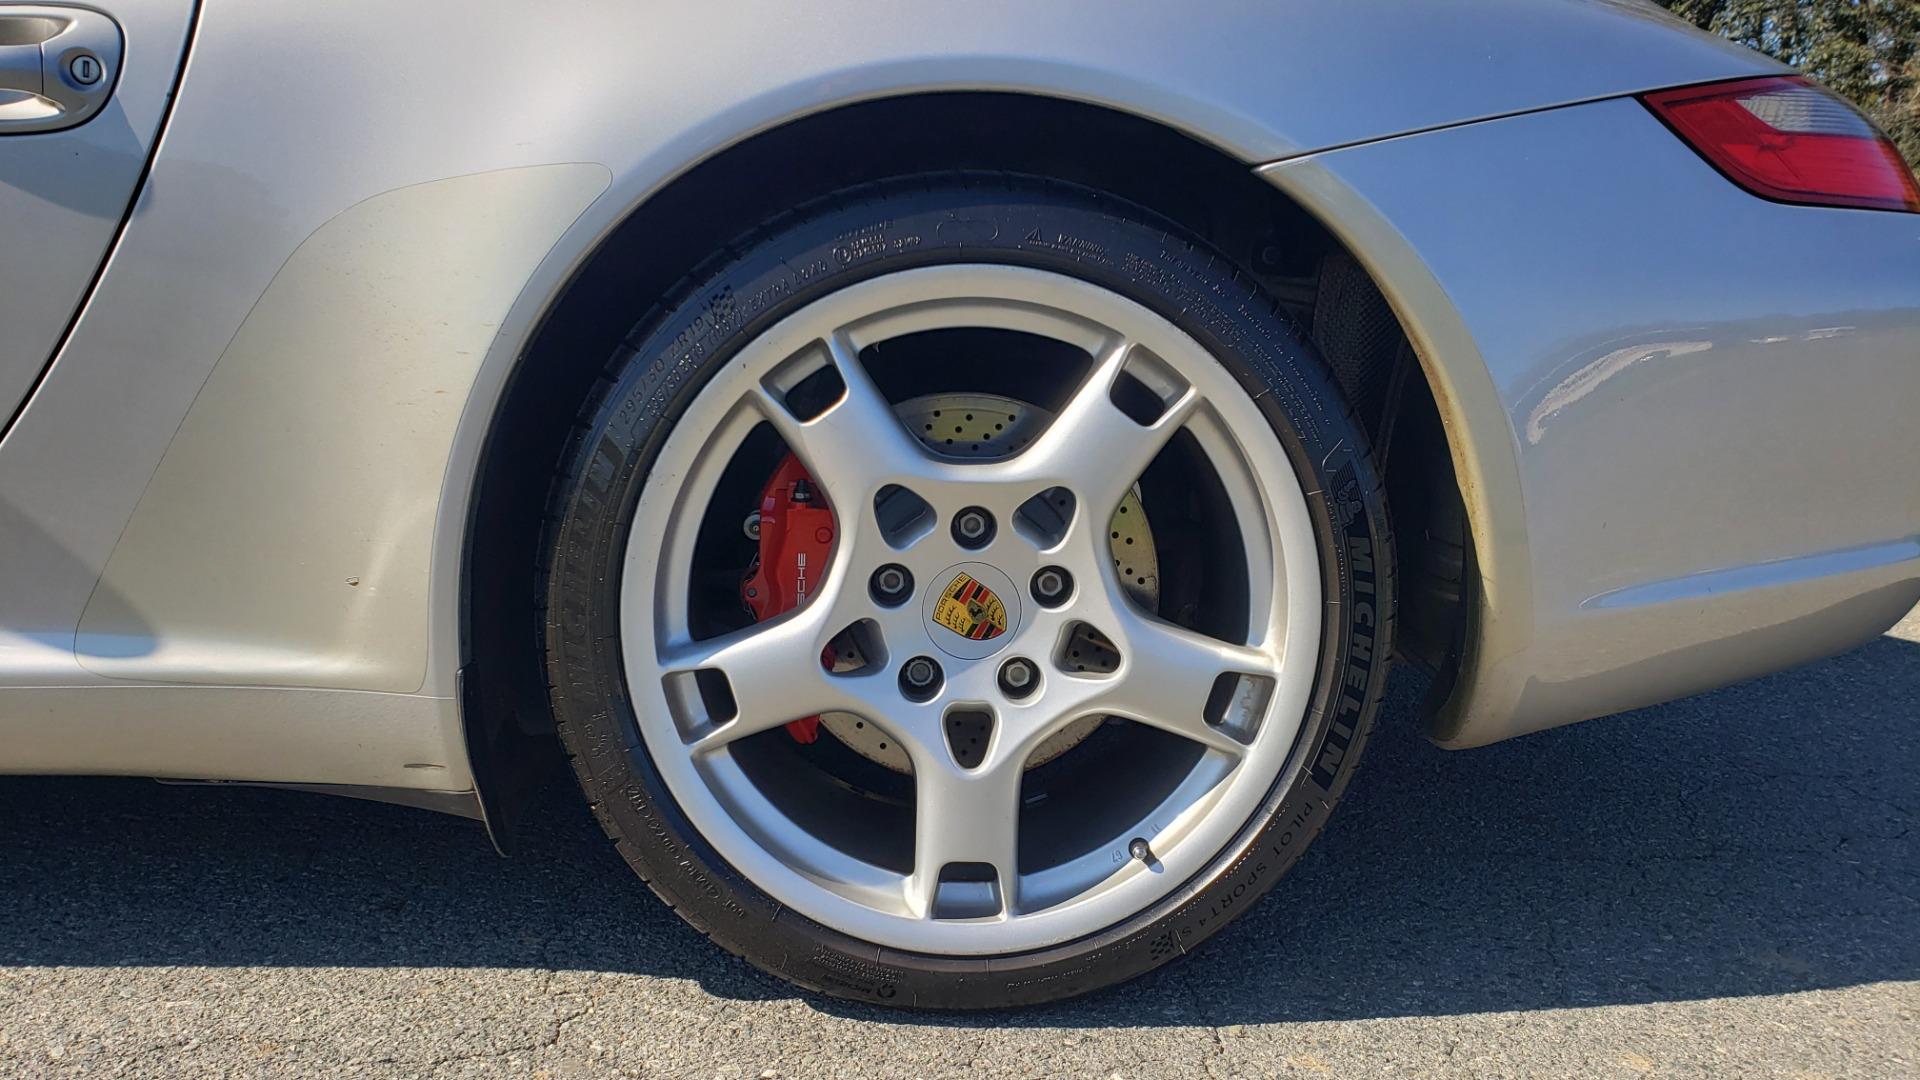 Used 2006 Porsche 911 CARRERA S / 5-SPD AUTO / SPORT CHRONO / NAV / BOSE / SUNROOF for sale Sold at Formula Imports in Charlotte NC 28227 80